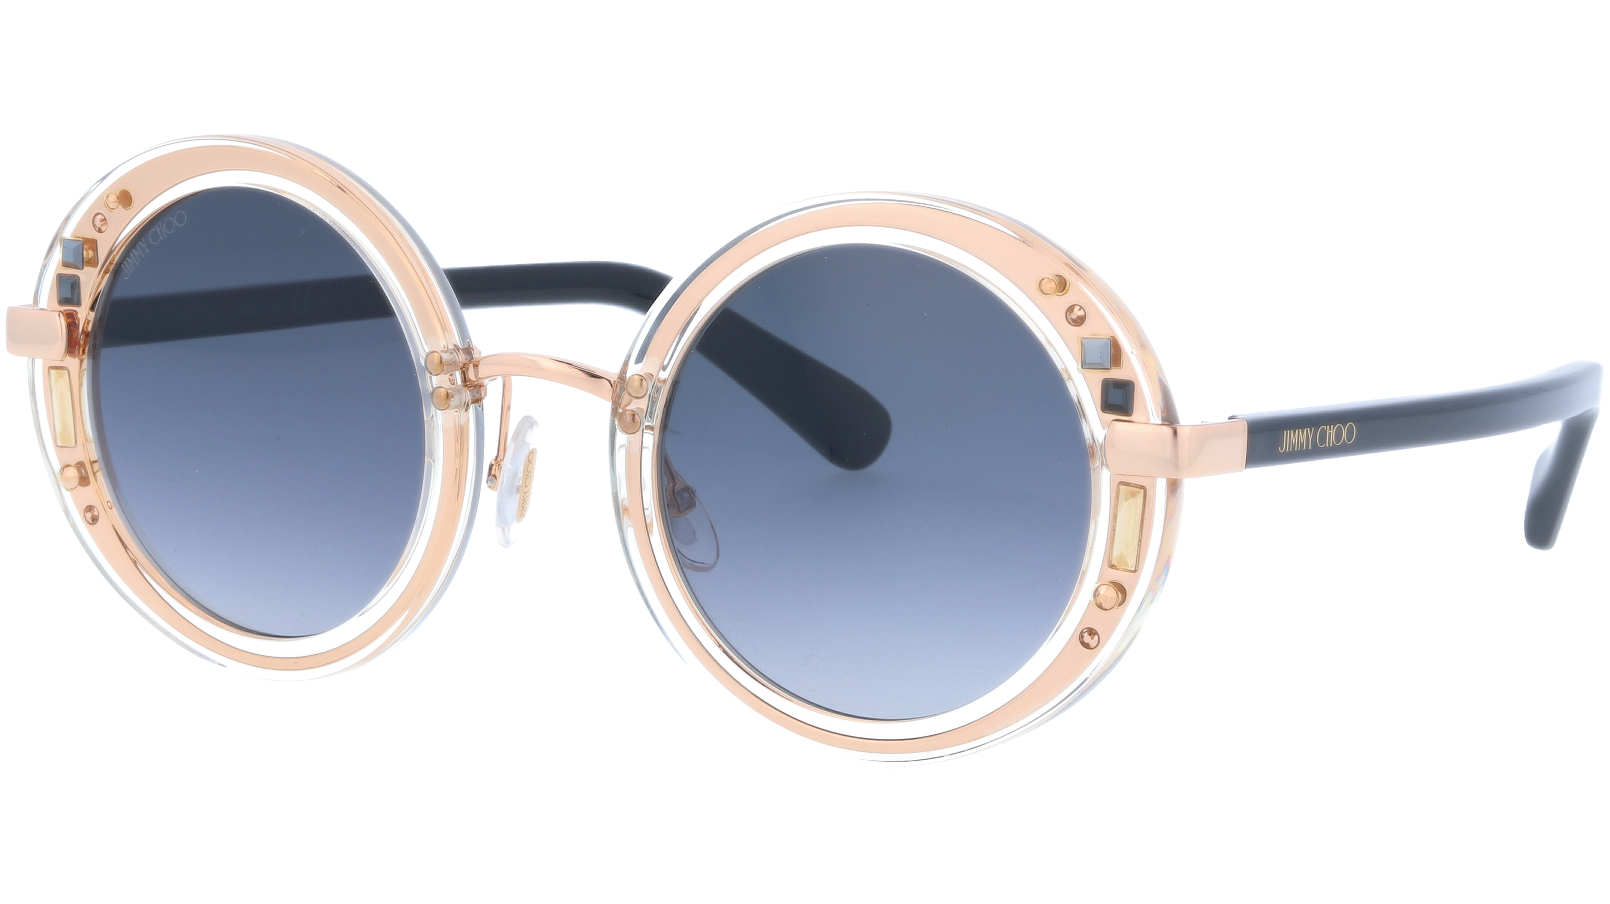 JIMMY CHOO GEMS 1FN90 48 CRYSTAL Sunglasses